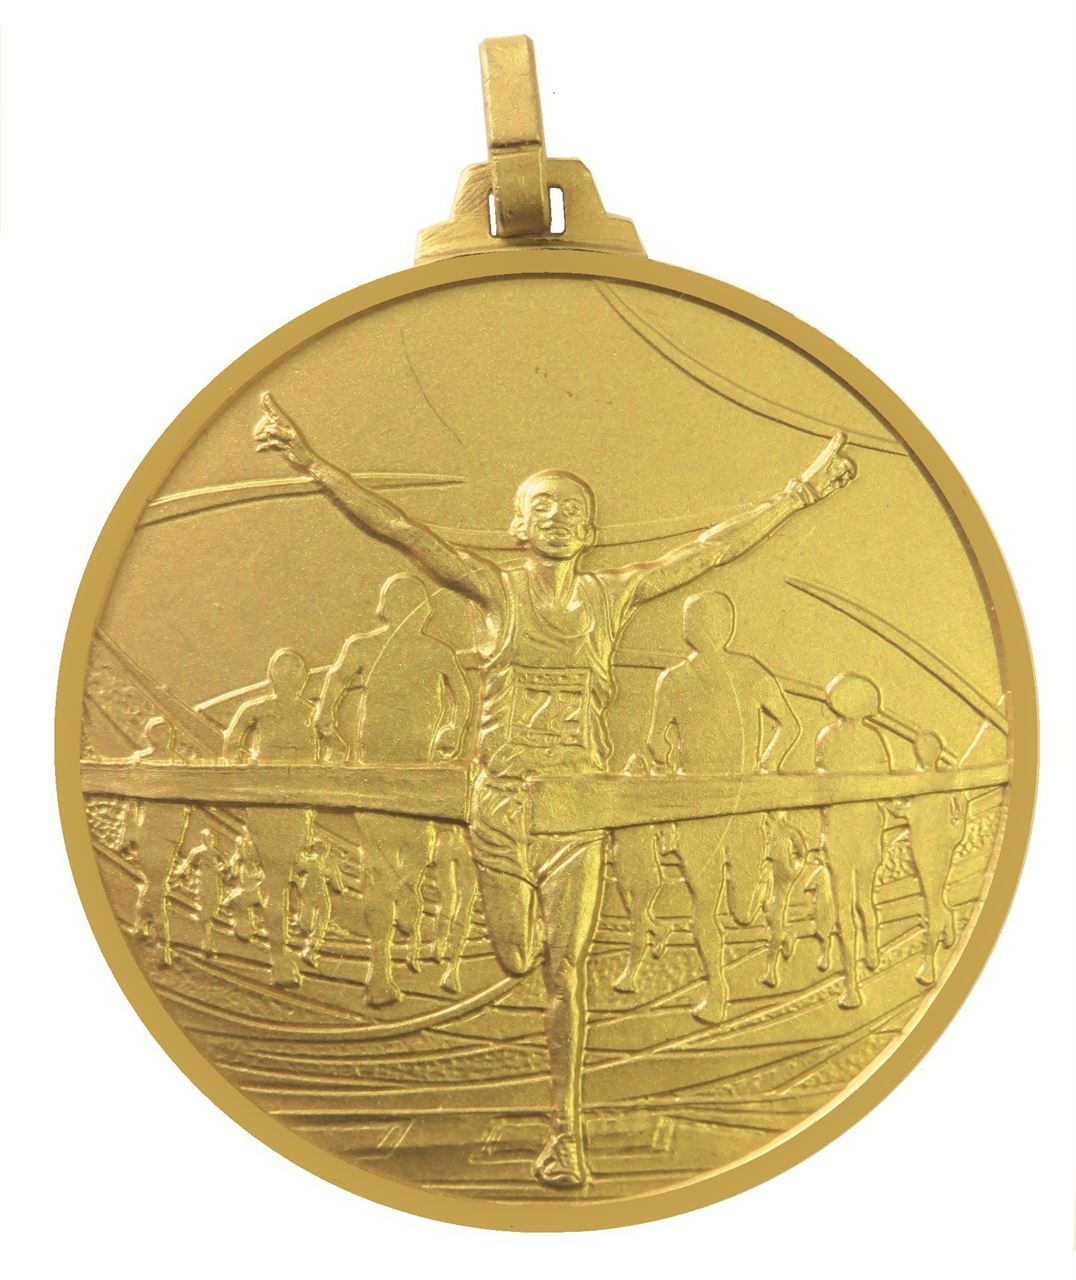 Gold Faceted Winning Runner Medal (size: 52mm) - 438/52G